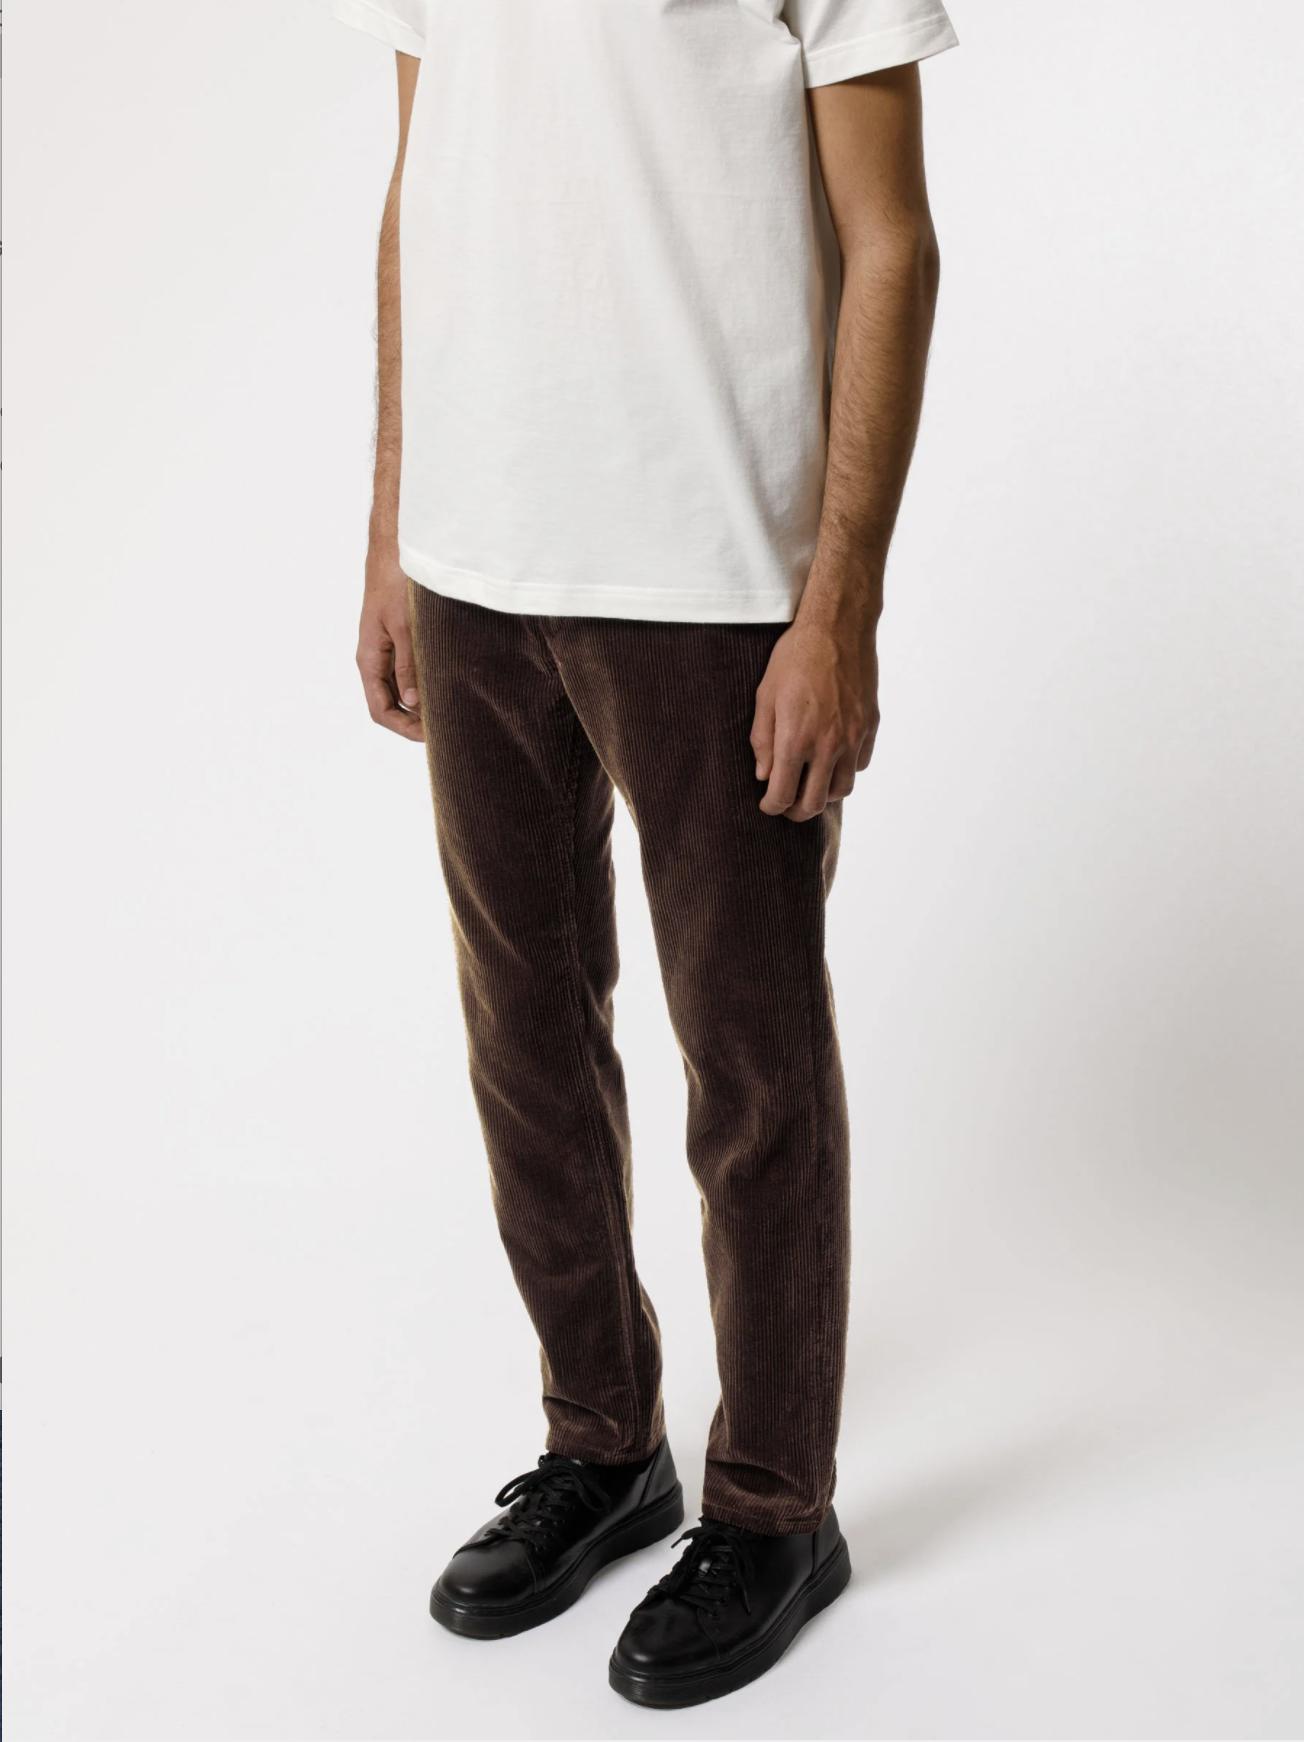 mespromenades-le-pantalon-dautmne-nudie-jeans-Easy-Alvin-Brown-Cord-120163-27_2400x2400-02